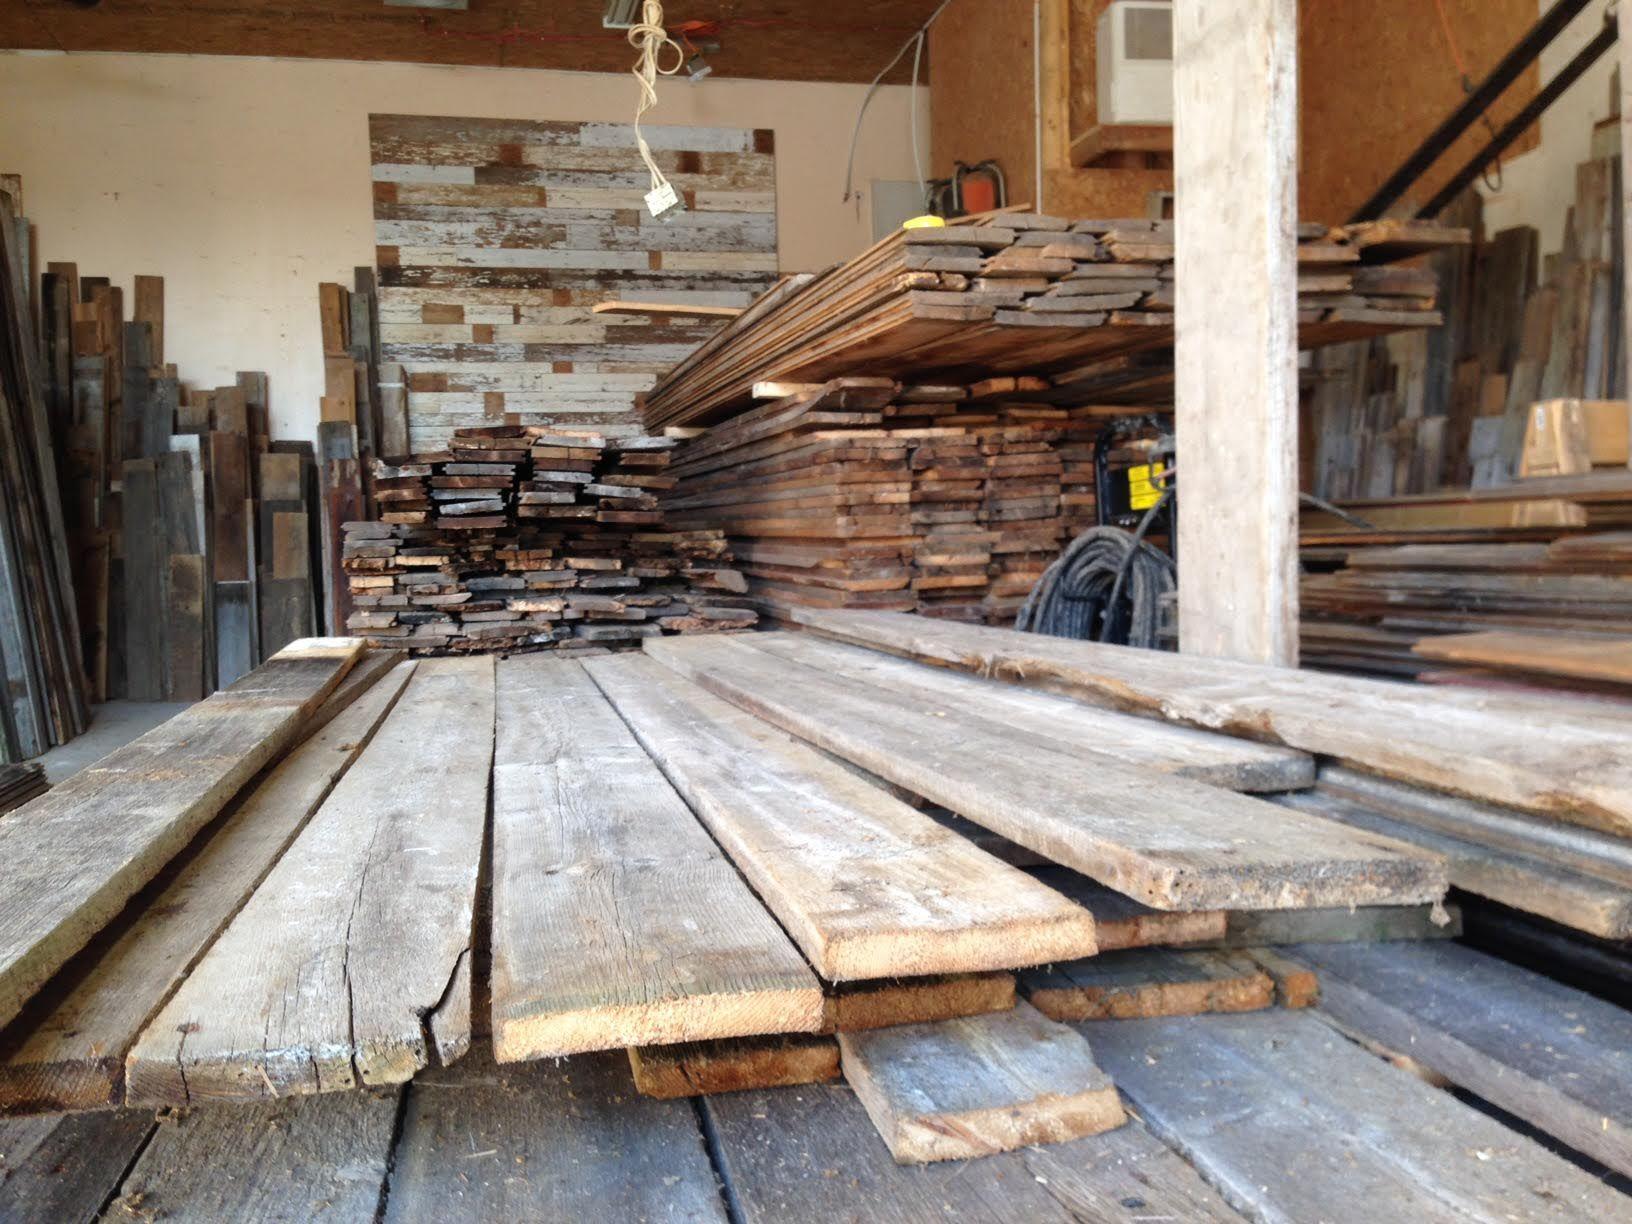 beton cir sur du bois stunning beton cir sur du bois with. Black Bedroom Furniture Sets. Home Design Ideas